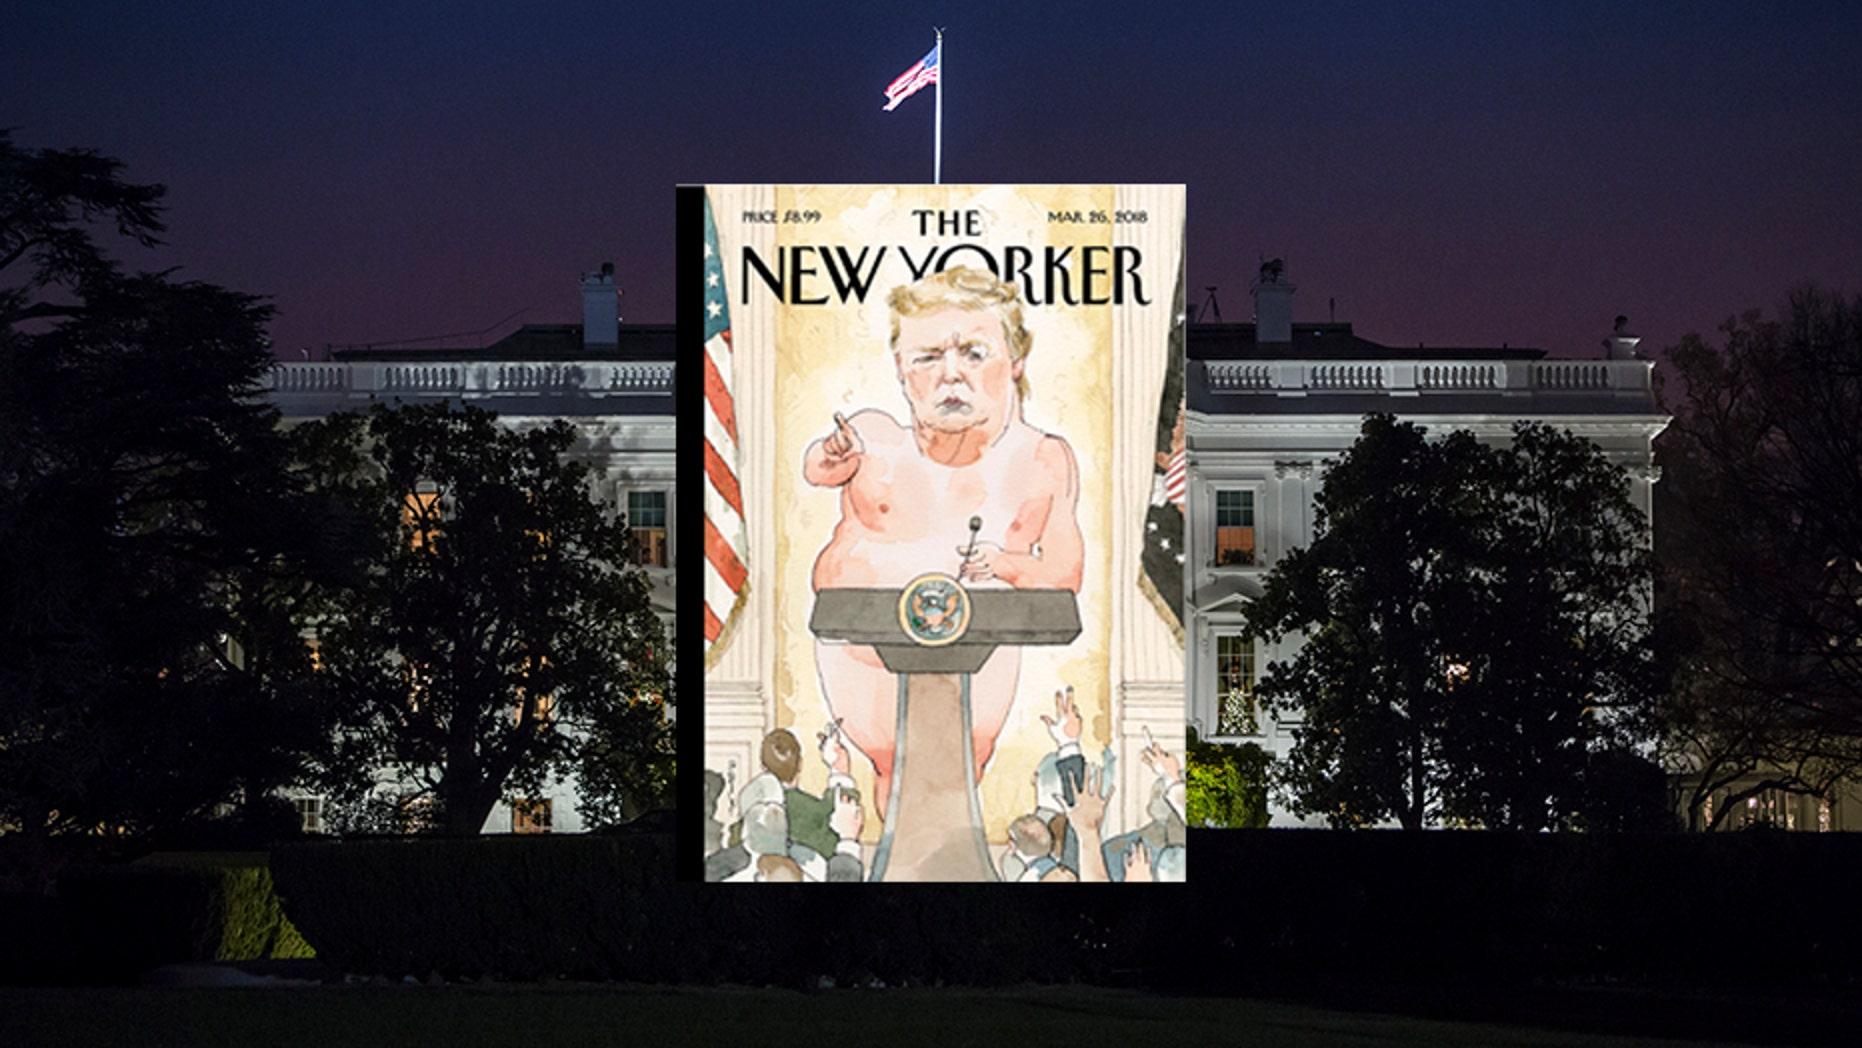 Critics claim the magazine cover body-shames President Trump